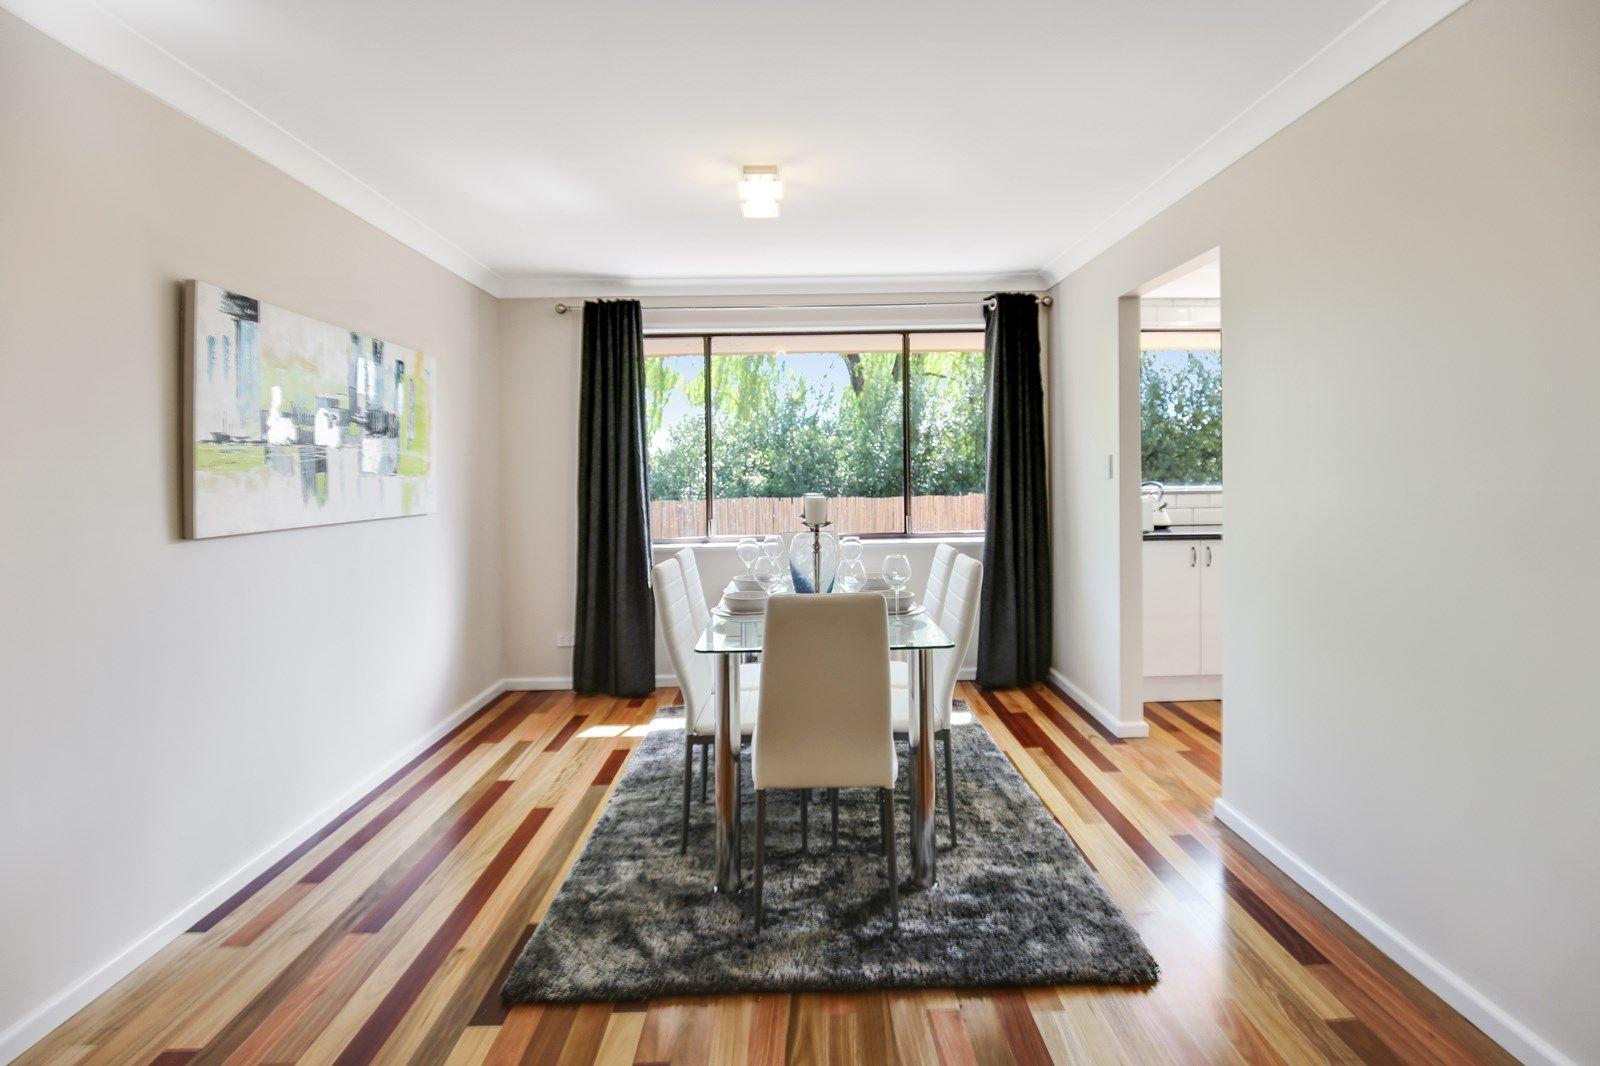 5/155 SAMPSON STREET, Orange NSW 2800, Image 2